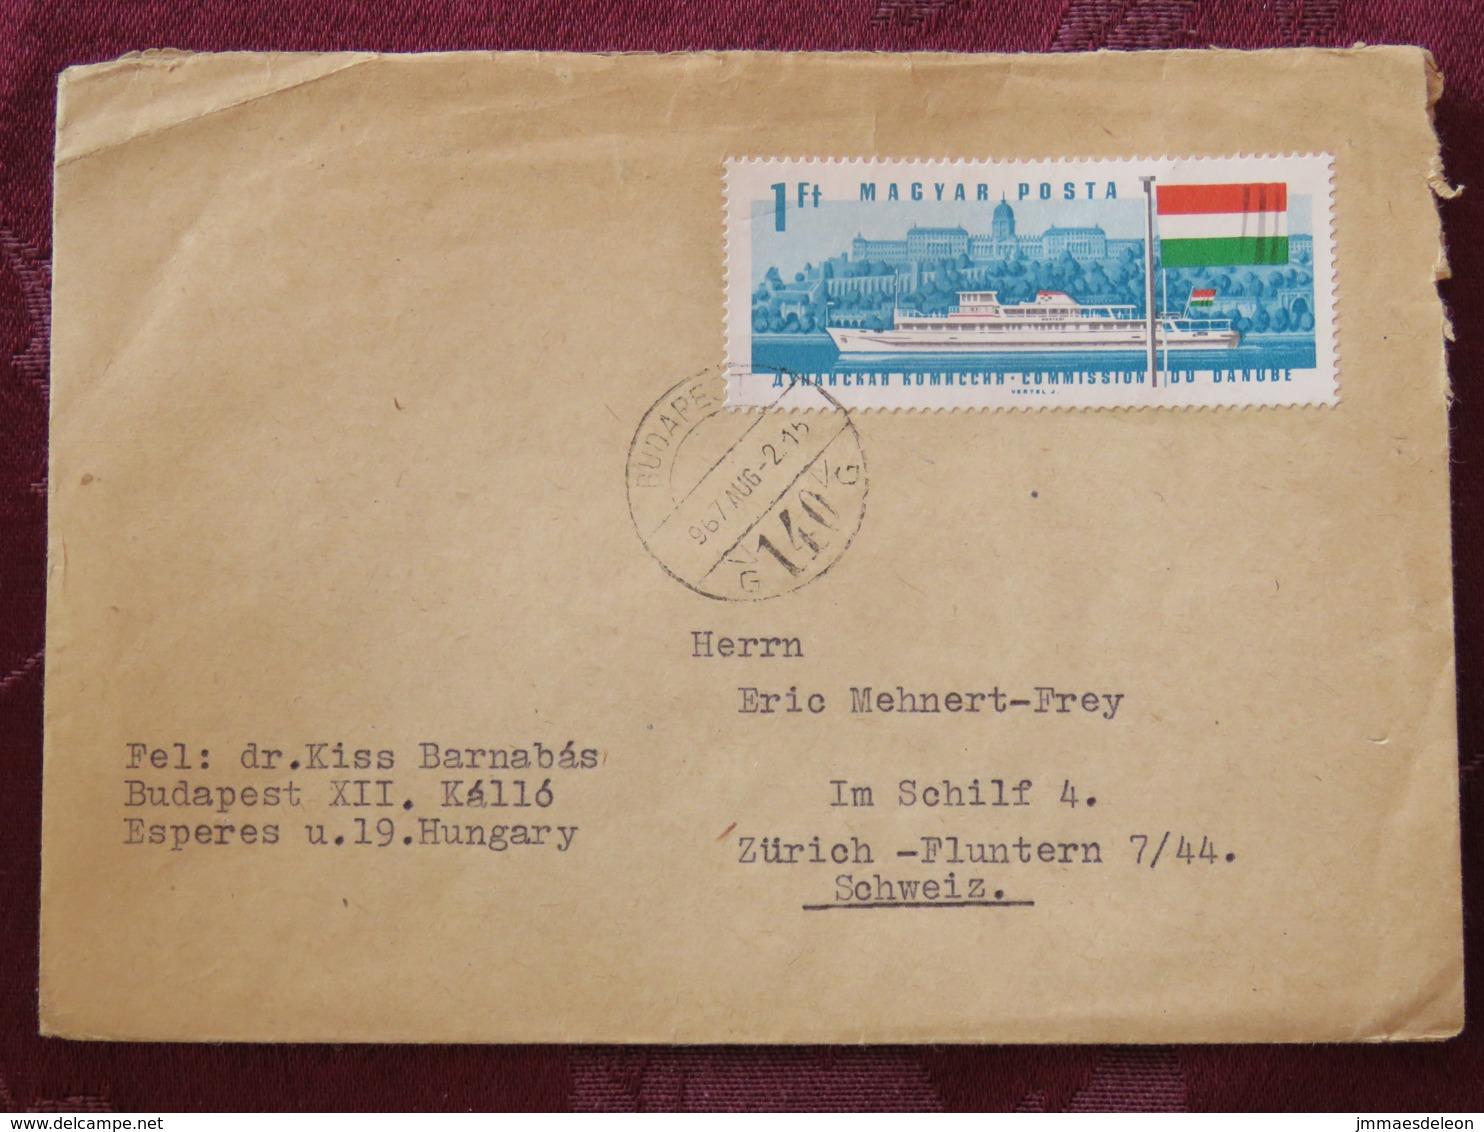 Hungary 1967 Cover Budapest To Switzerland - Ship - Flag - Danube River - Hungary